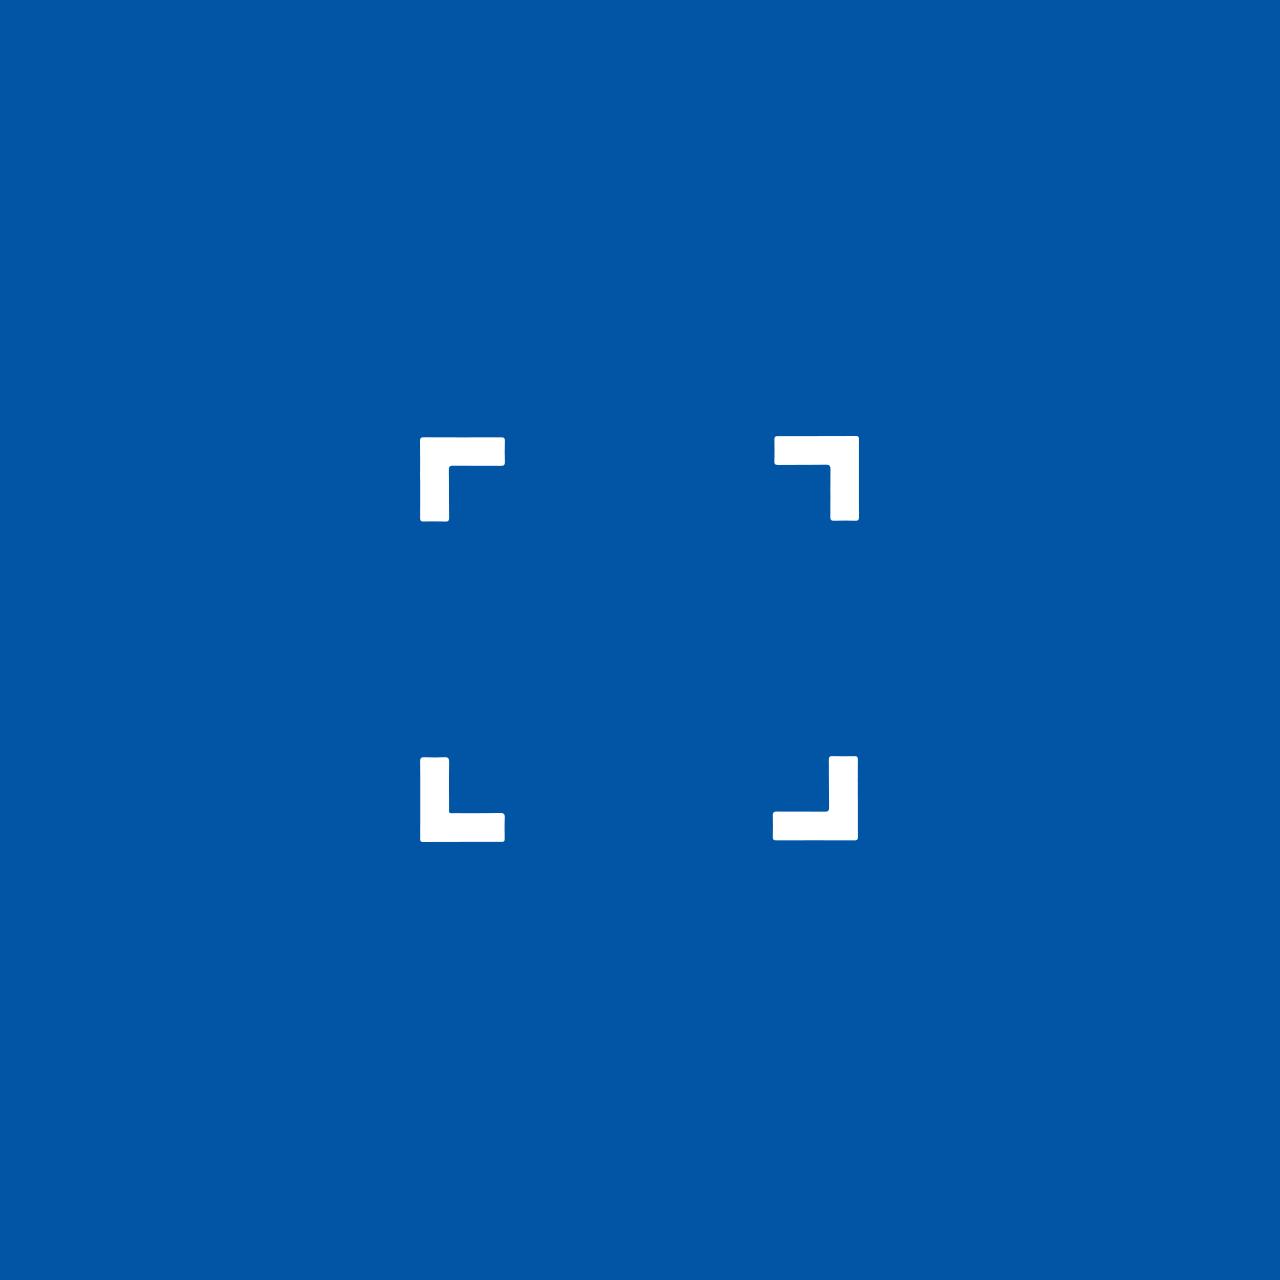 Logo - Business Financial Management - Startup CFO - Entrepreneur Consulting - Clarityfi